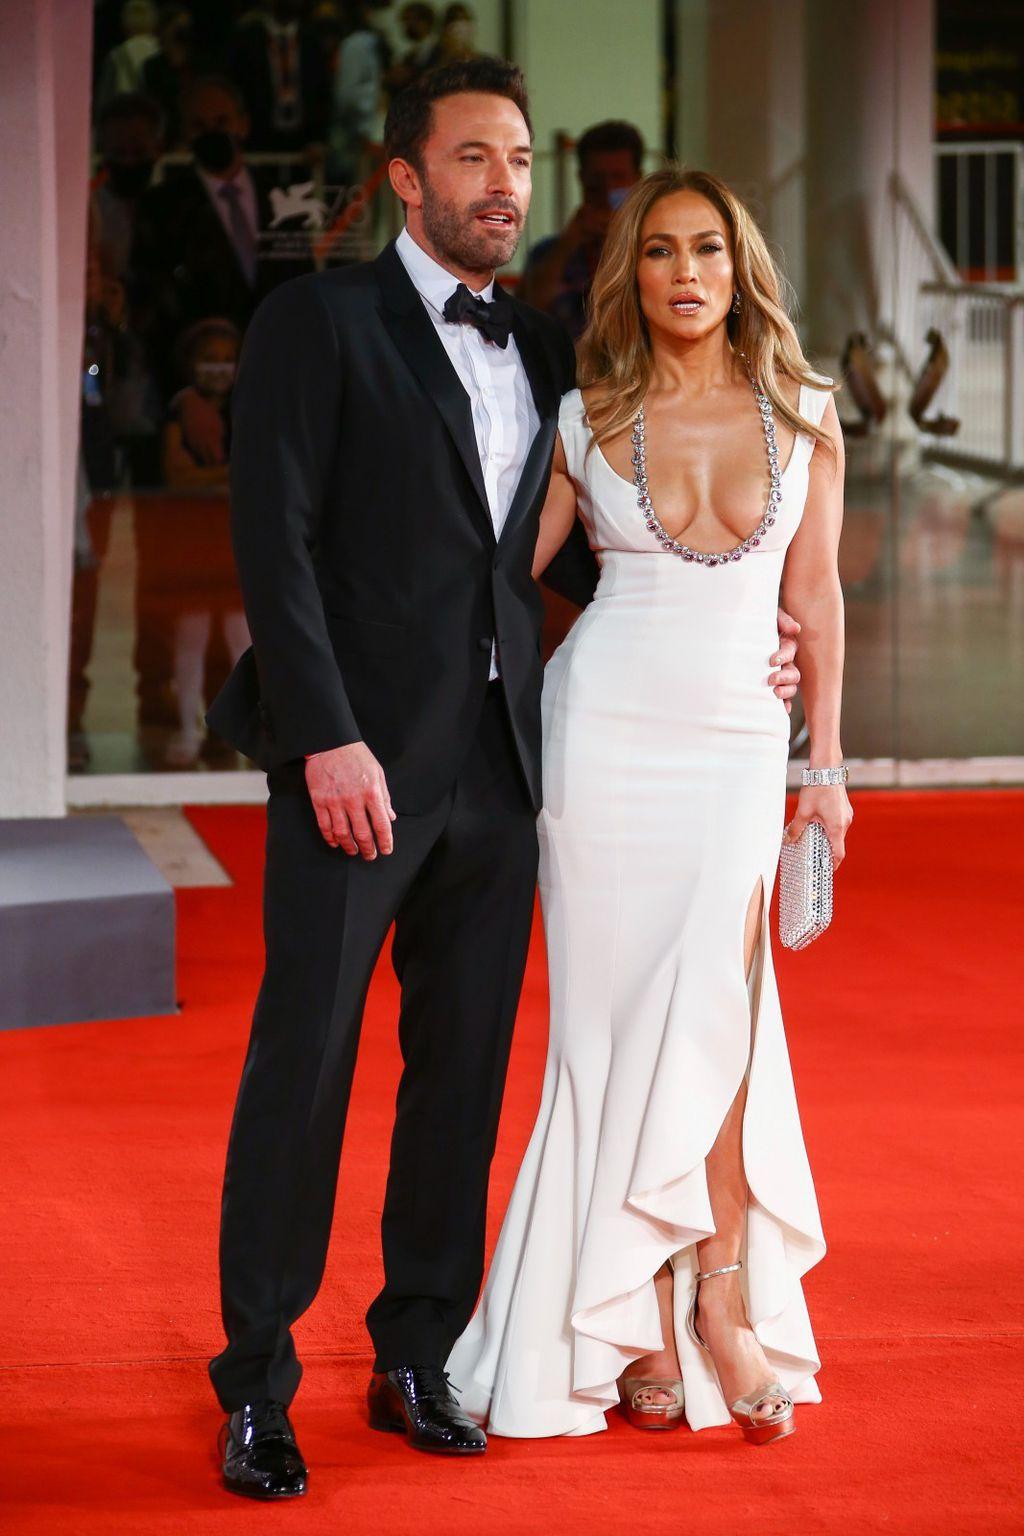 Jennifer Lopez bila je mamac za poglede na crvenom tepihu